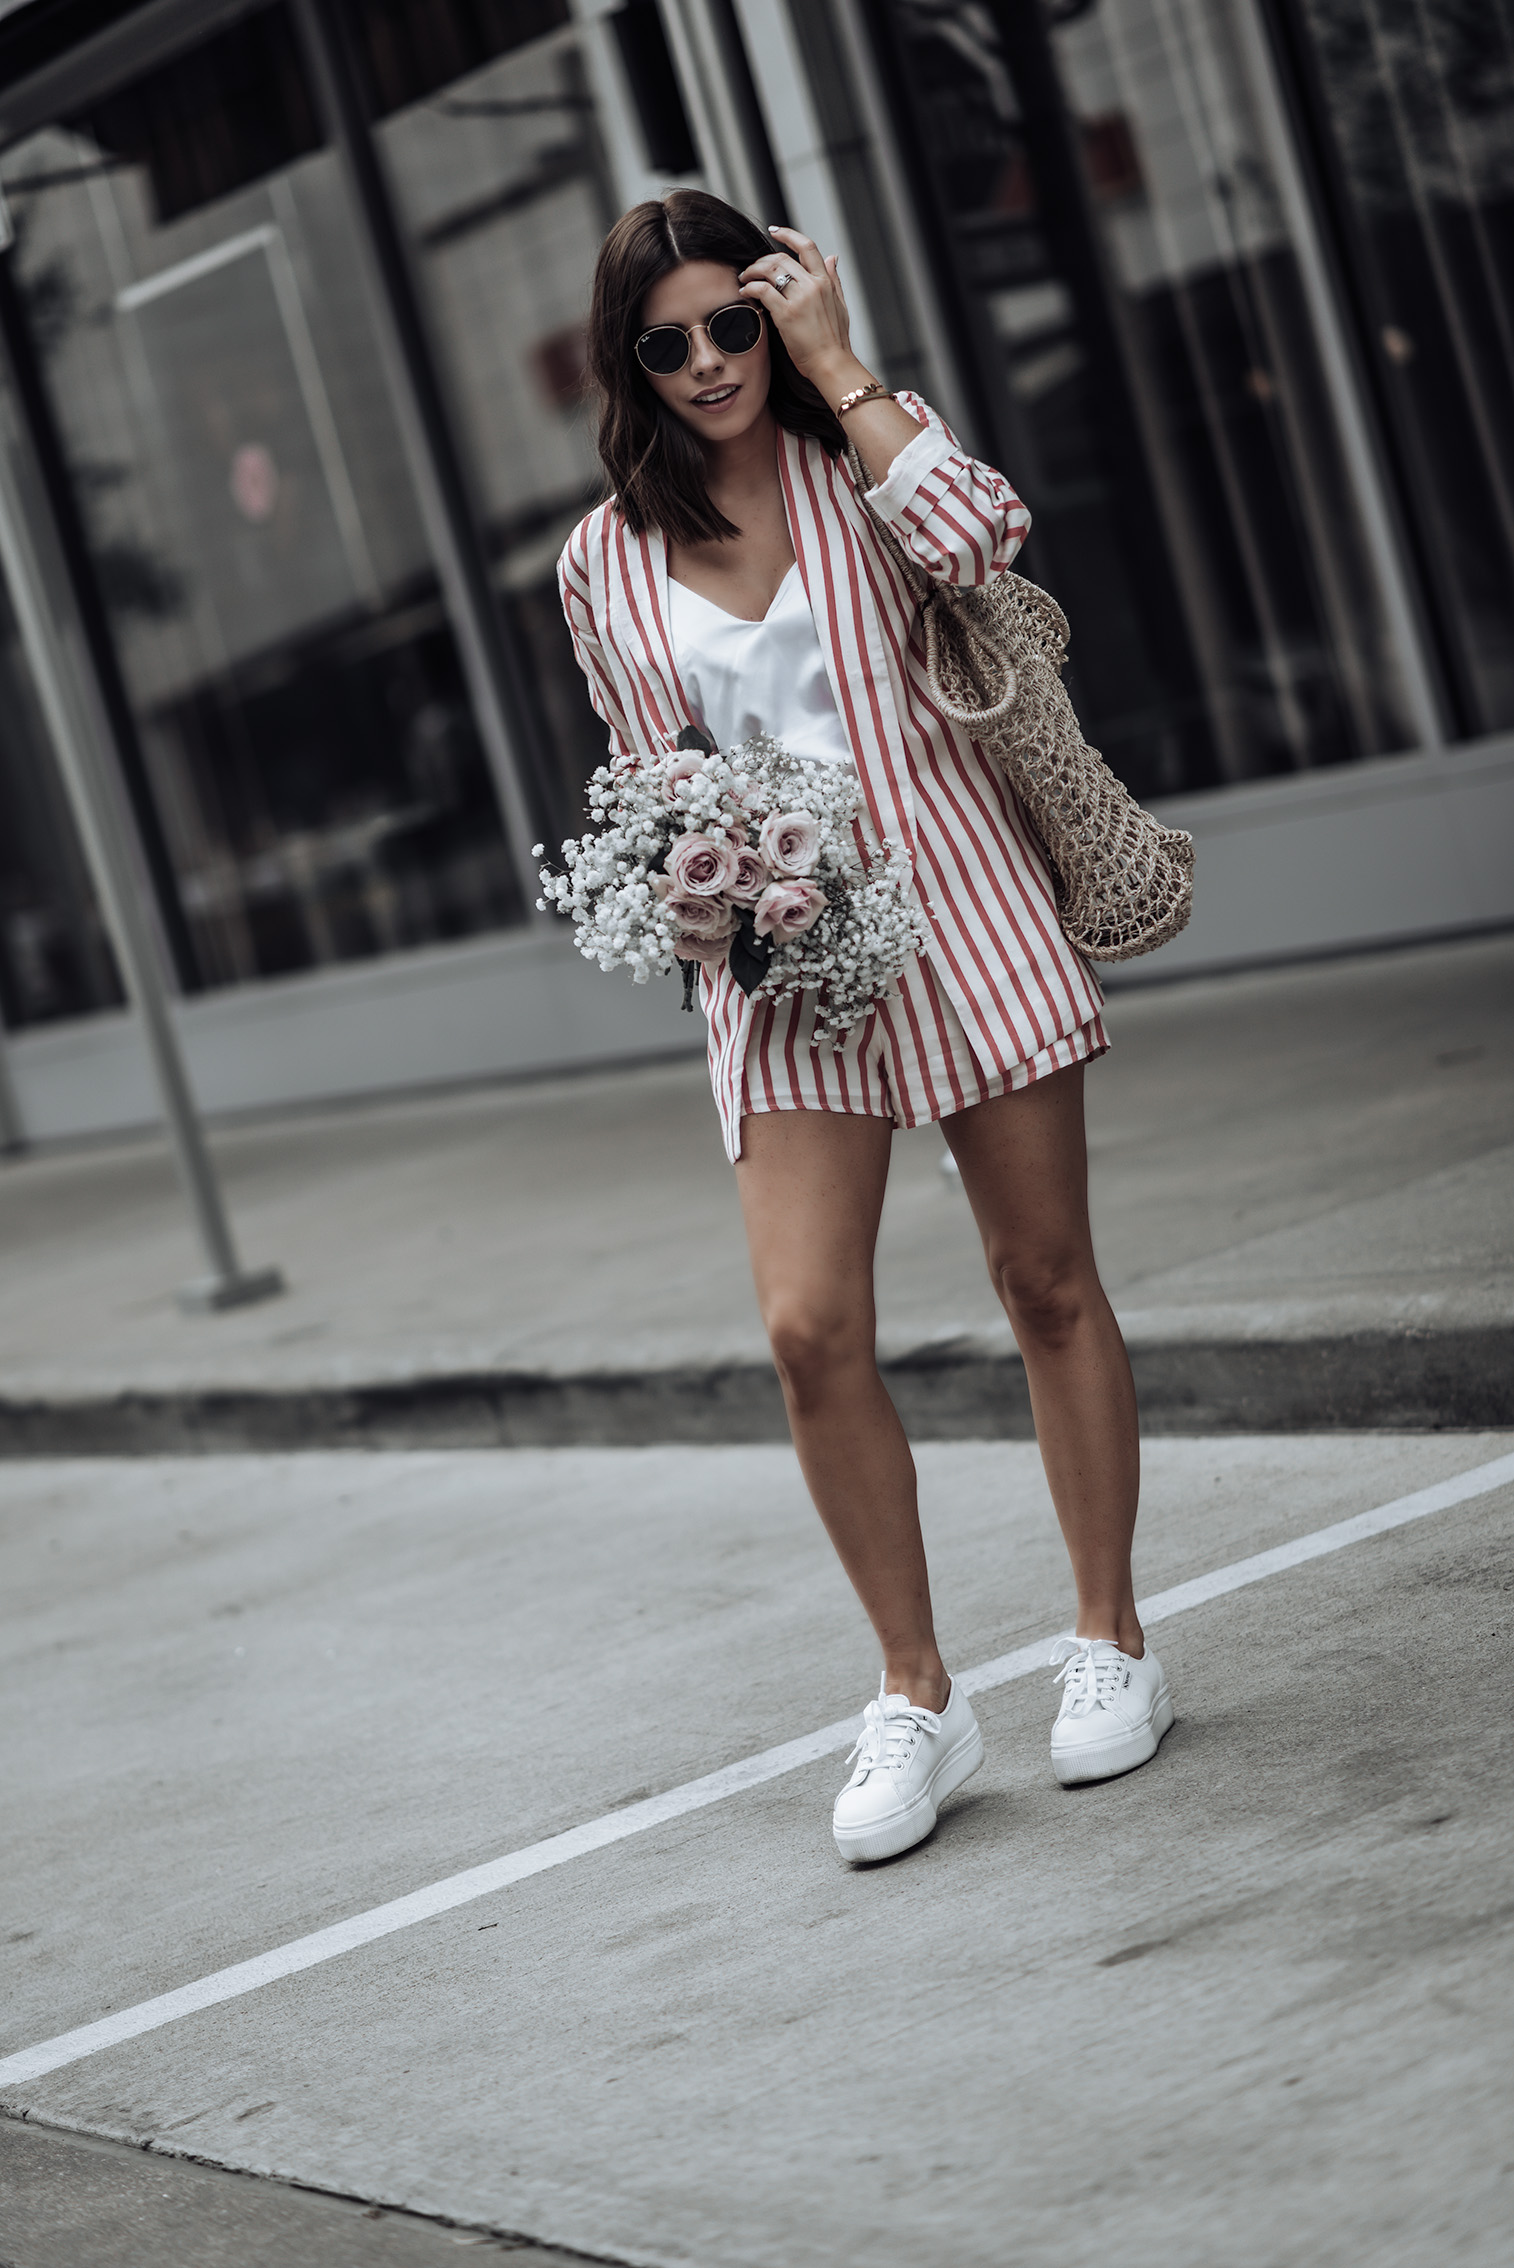 Striped Blazer set   L'Academie Adam Shorts   L'Academie Adam Blazer   Reformation bag   Superga Platform Sneakers  Bracelets: Here, & here   #liketkit #revolve #strawbag #lookbook #fashion #streetstyleblog